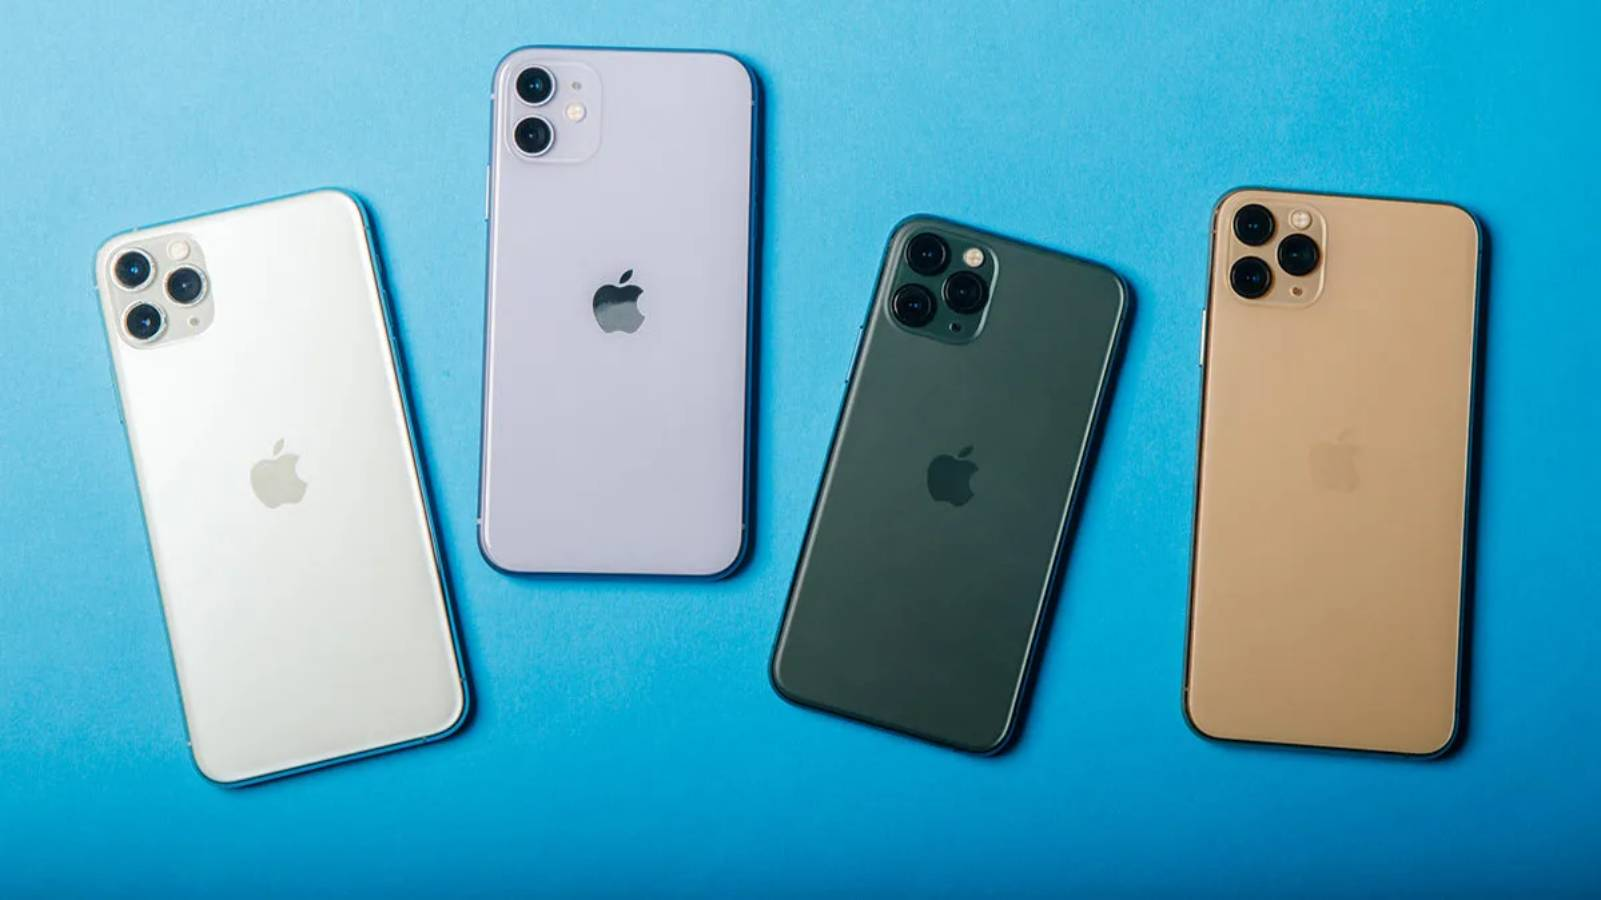 iPhone 11 Pro Max cel mai bun telefon